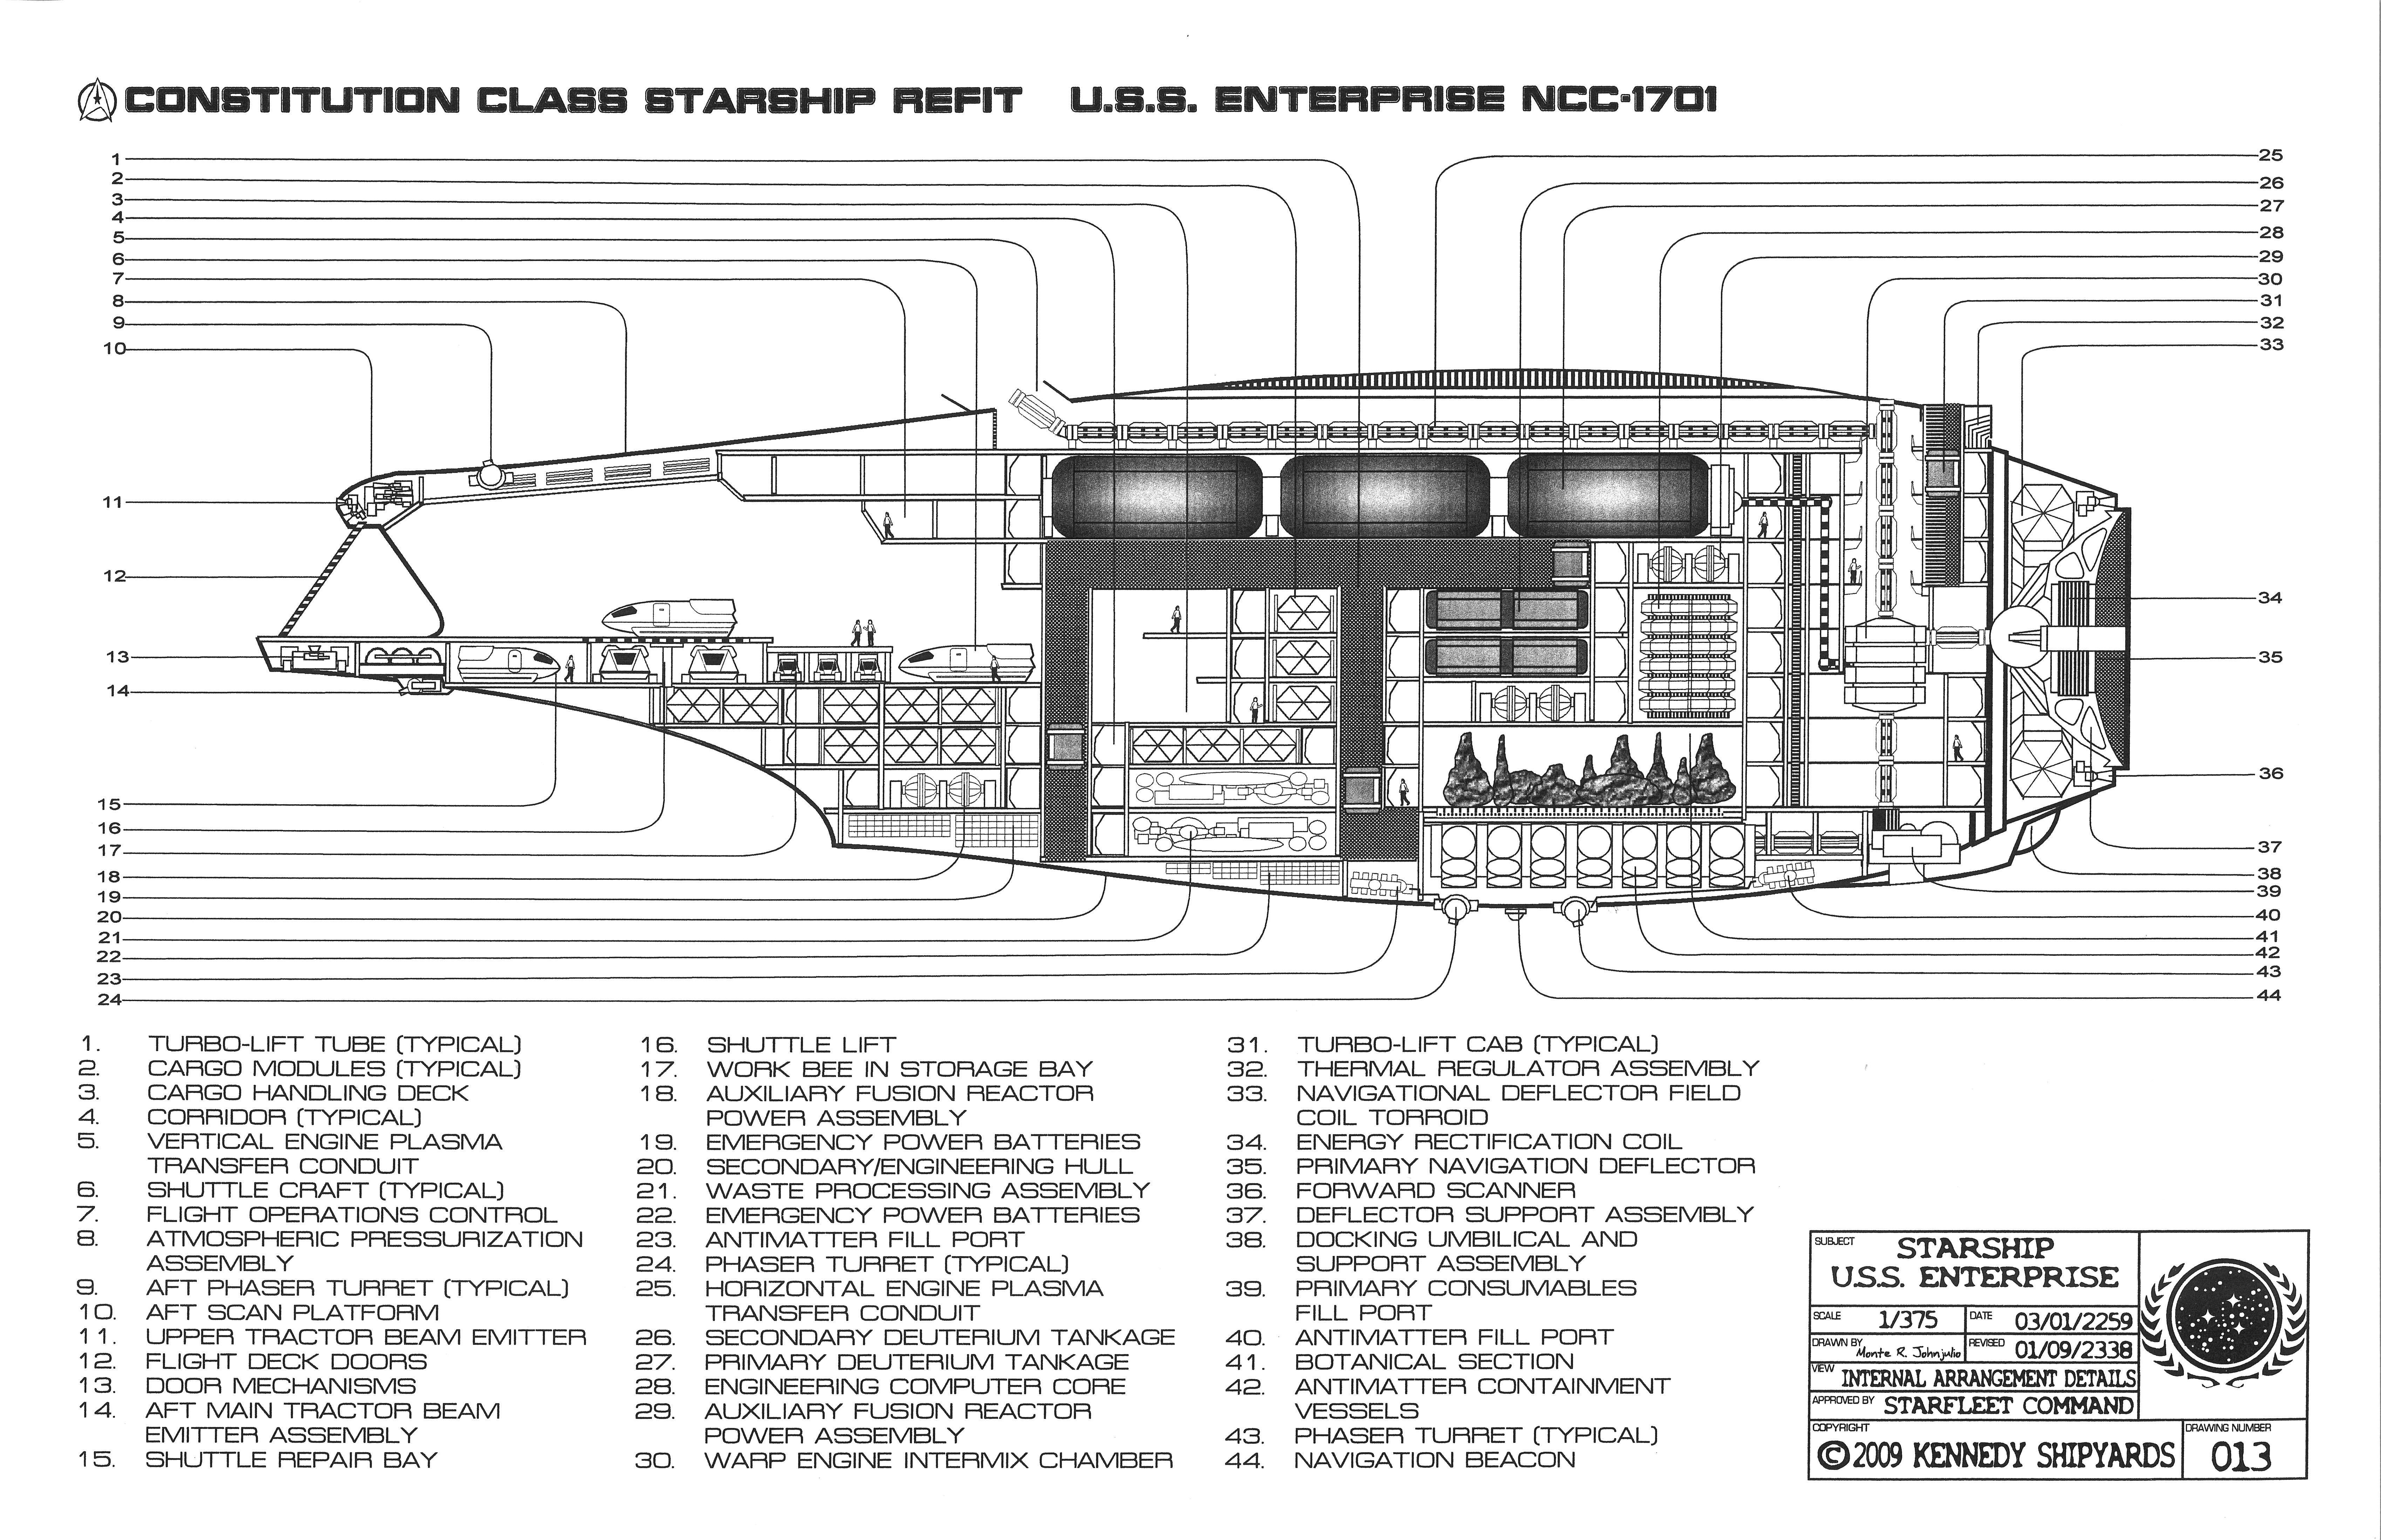 Uss enterprise ncc 1701 d galaxy class saucer separation r flickr - Enterprise Ncc 1701 Constitution Class Starship Refit Blueprints